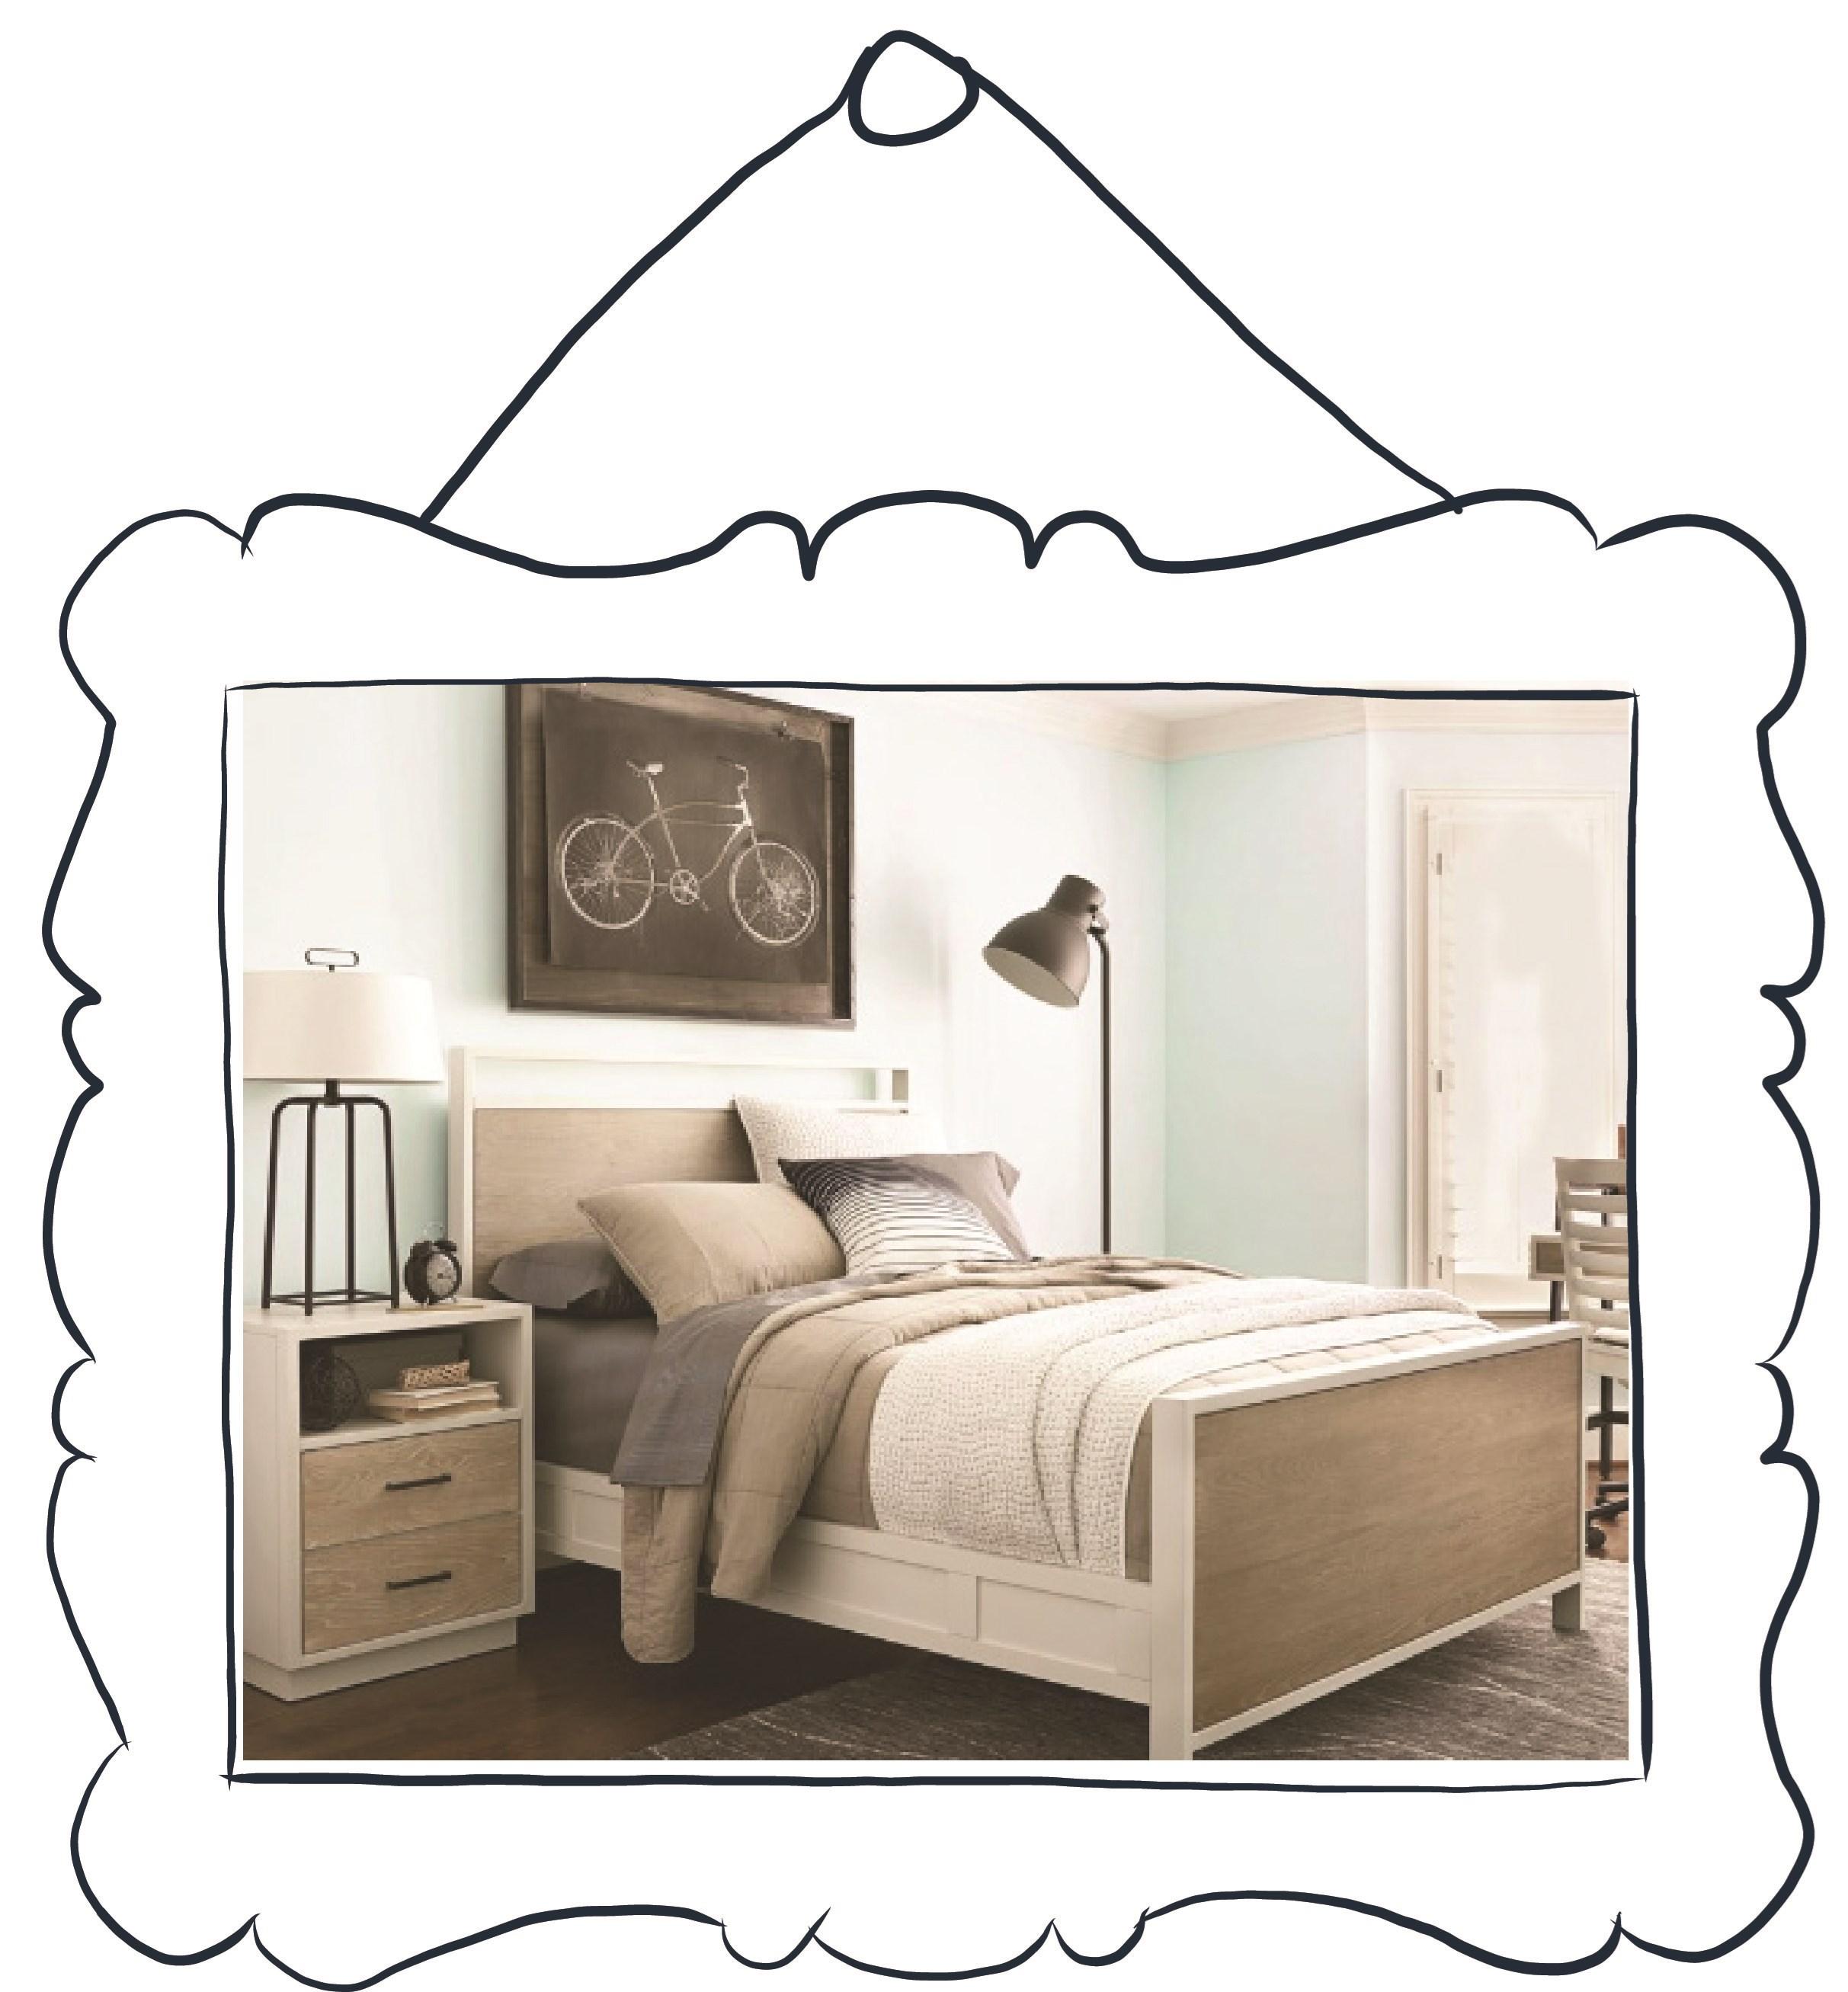 Patio Furniture Agoura Hills Ca: Los Angeles, Thousand Oaks, Simi Valley